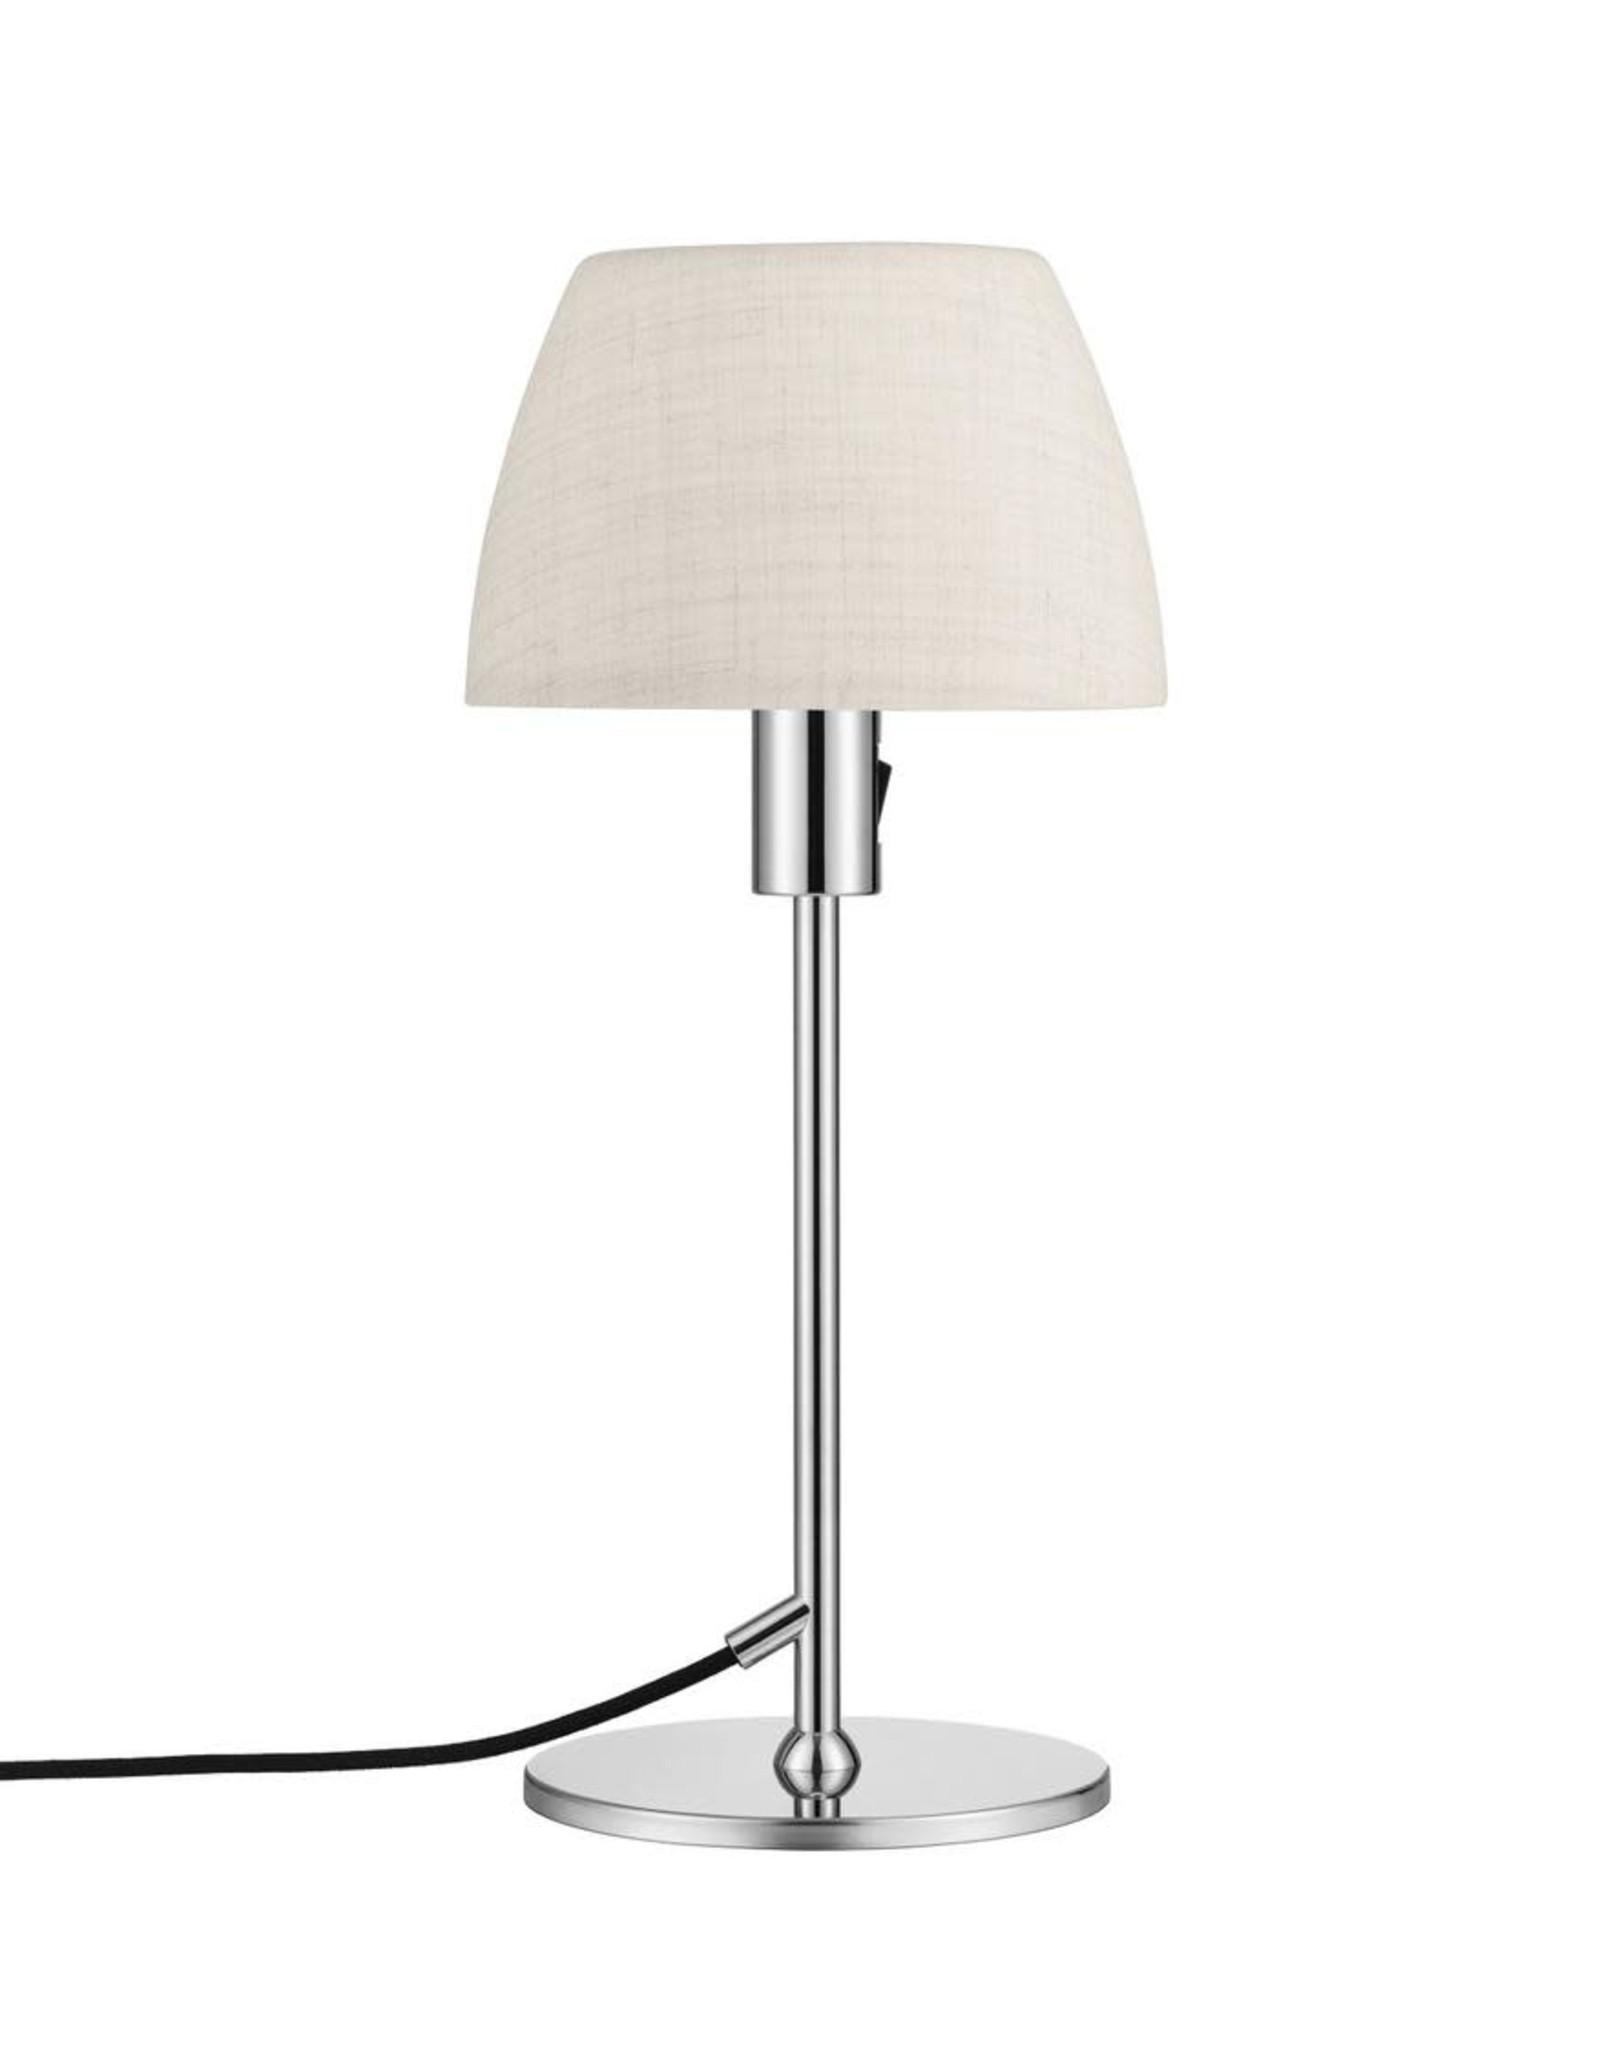 ATELJE LYKTAN BUZZ TEXTILE TABLE LAMP